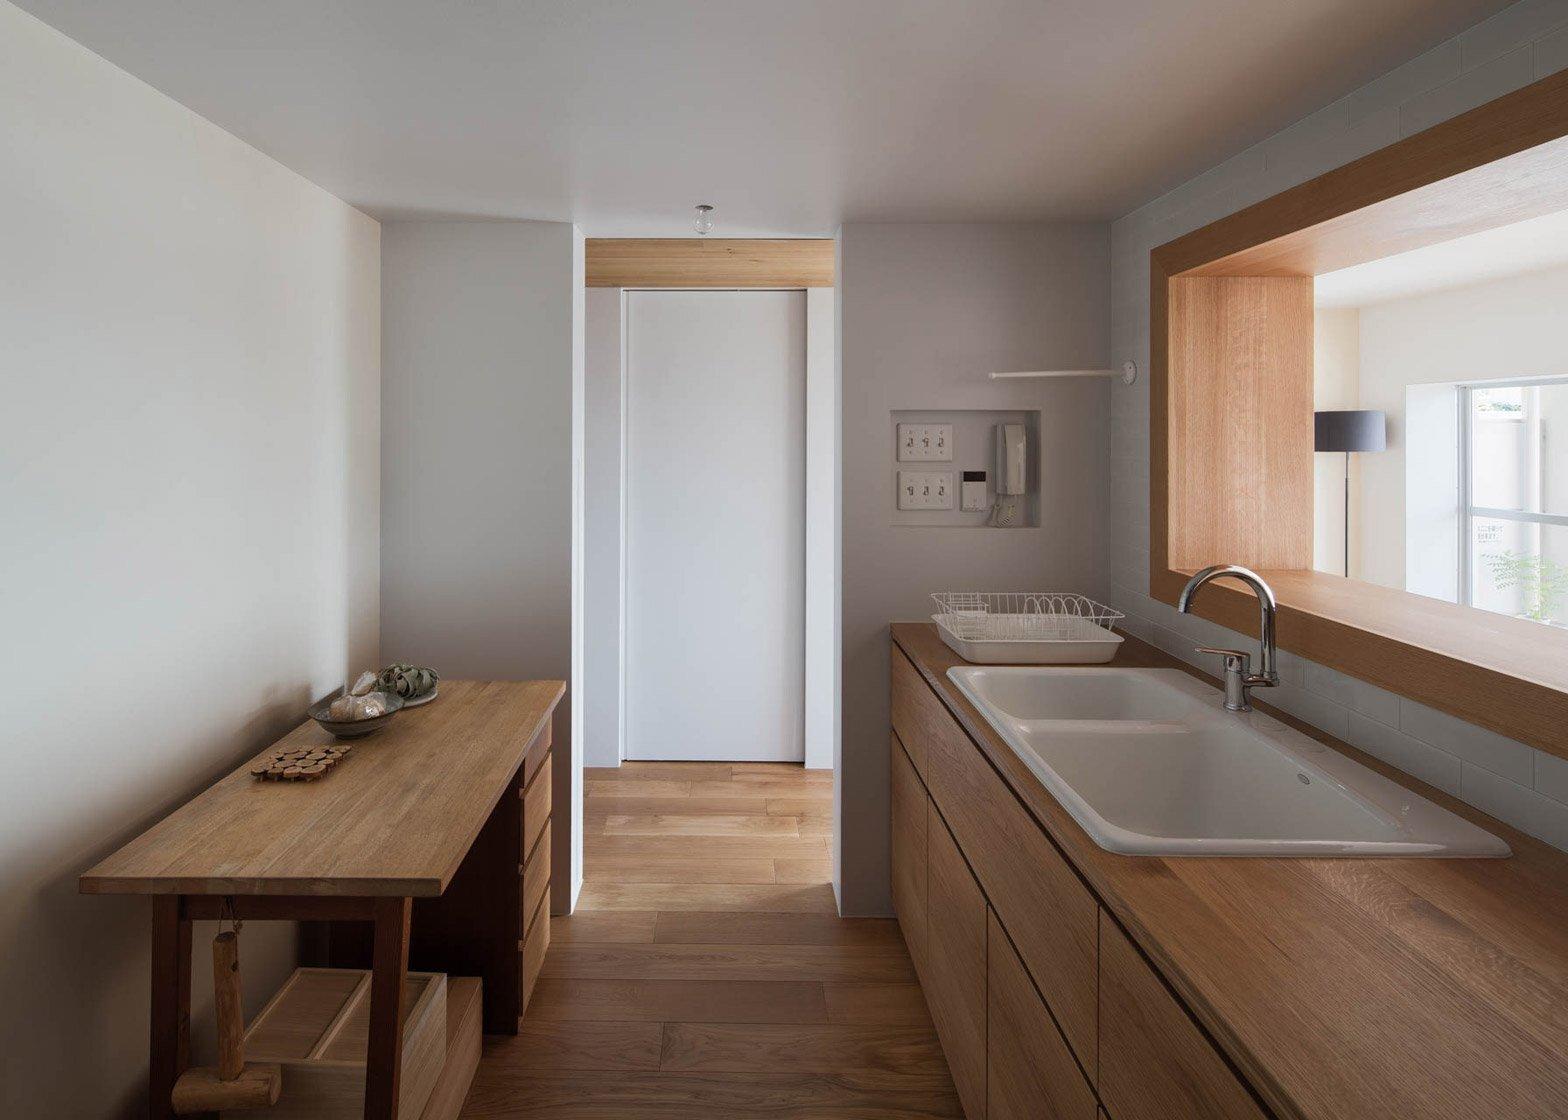 Apartment Machiya - Yumiko Miki Architects - Tokyo - Wood Kitchen - Humble Homes